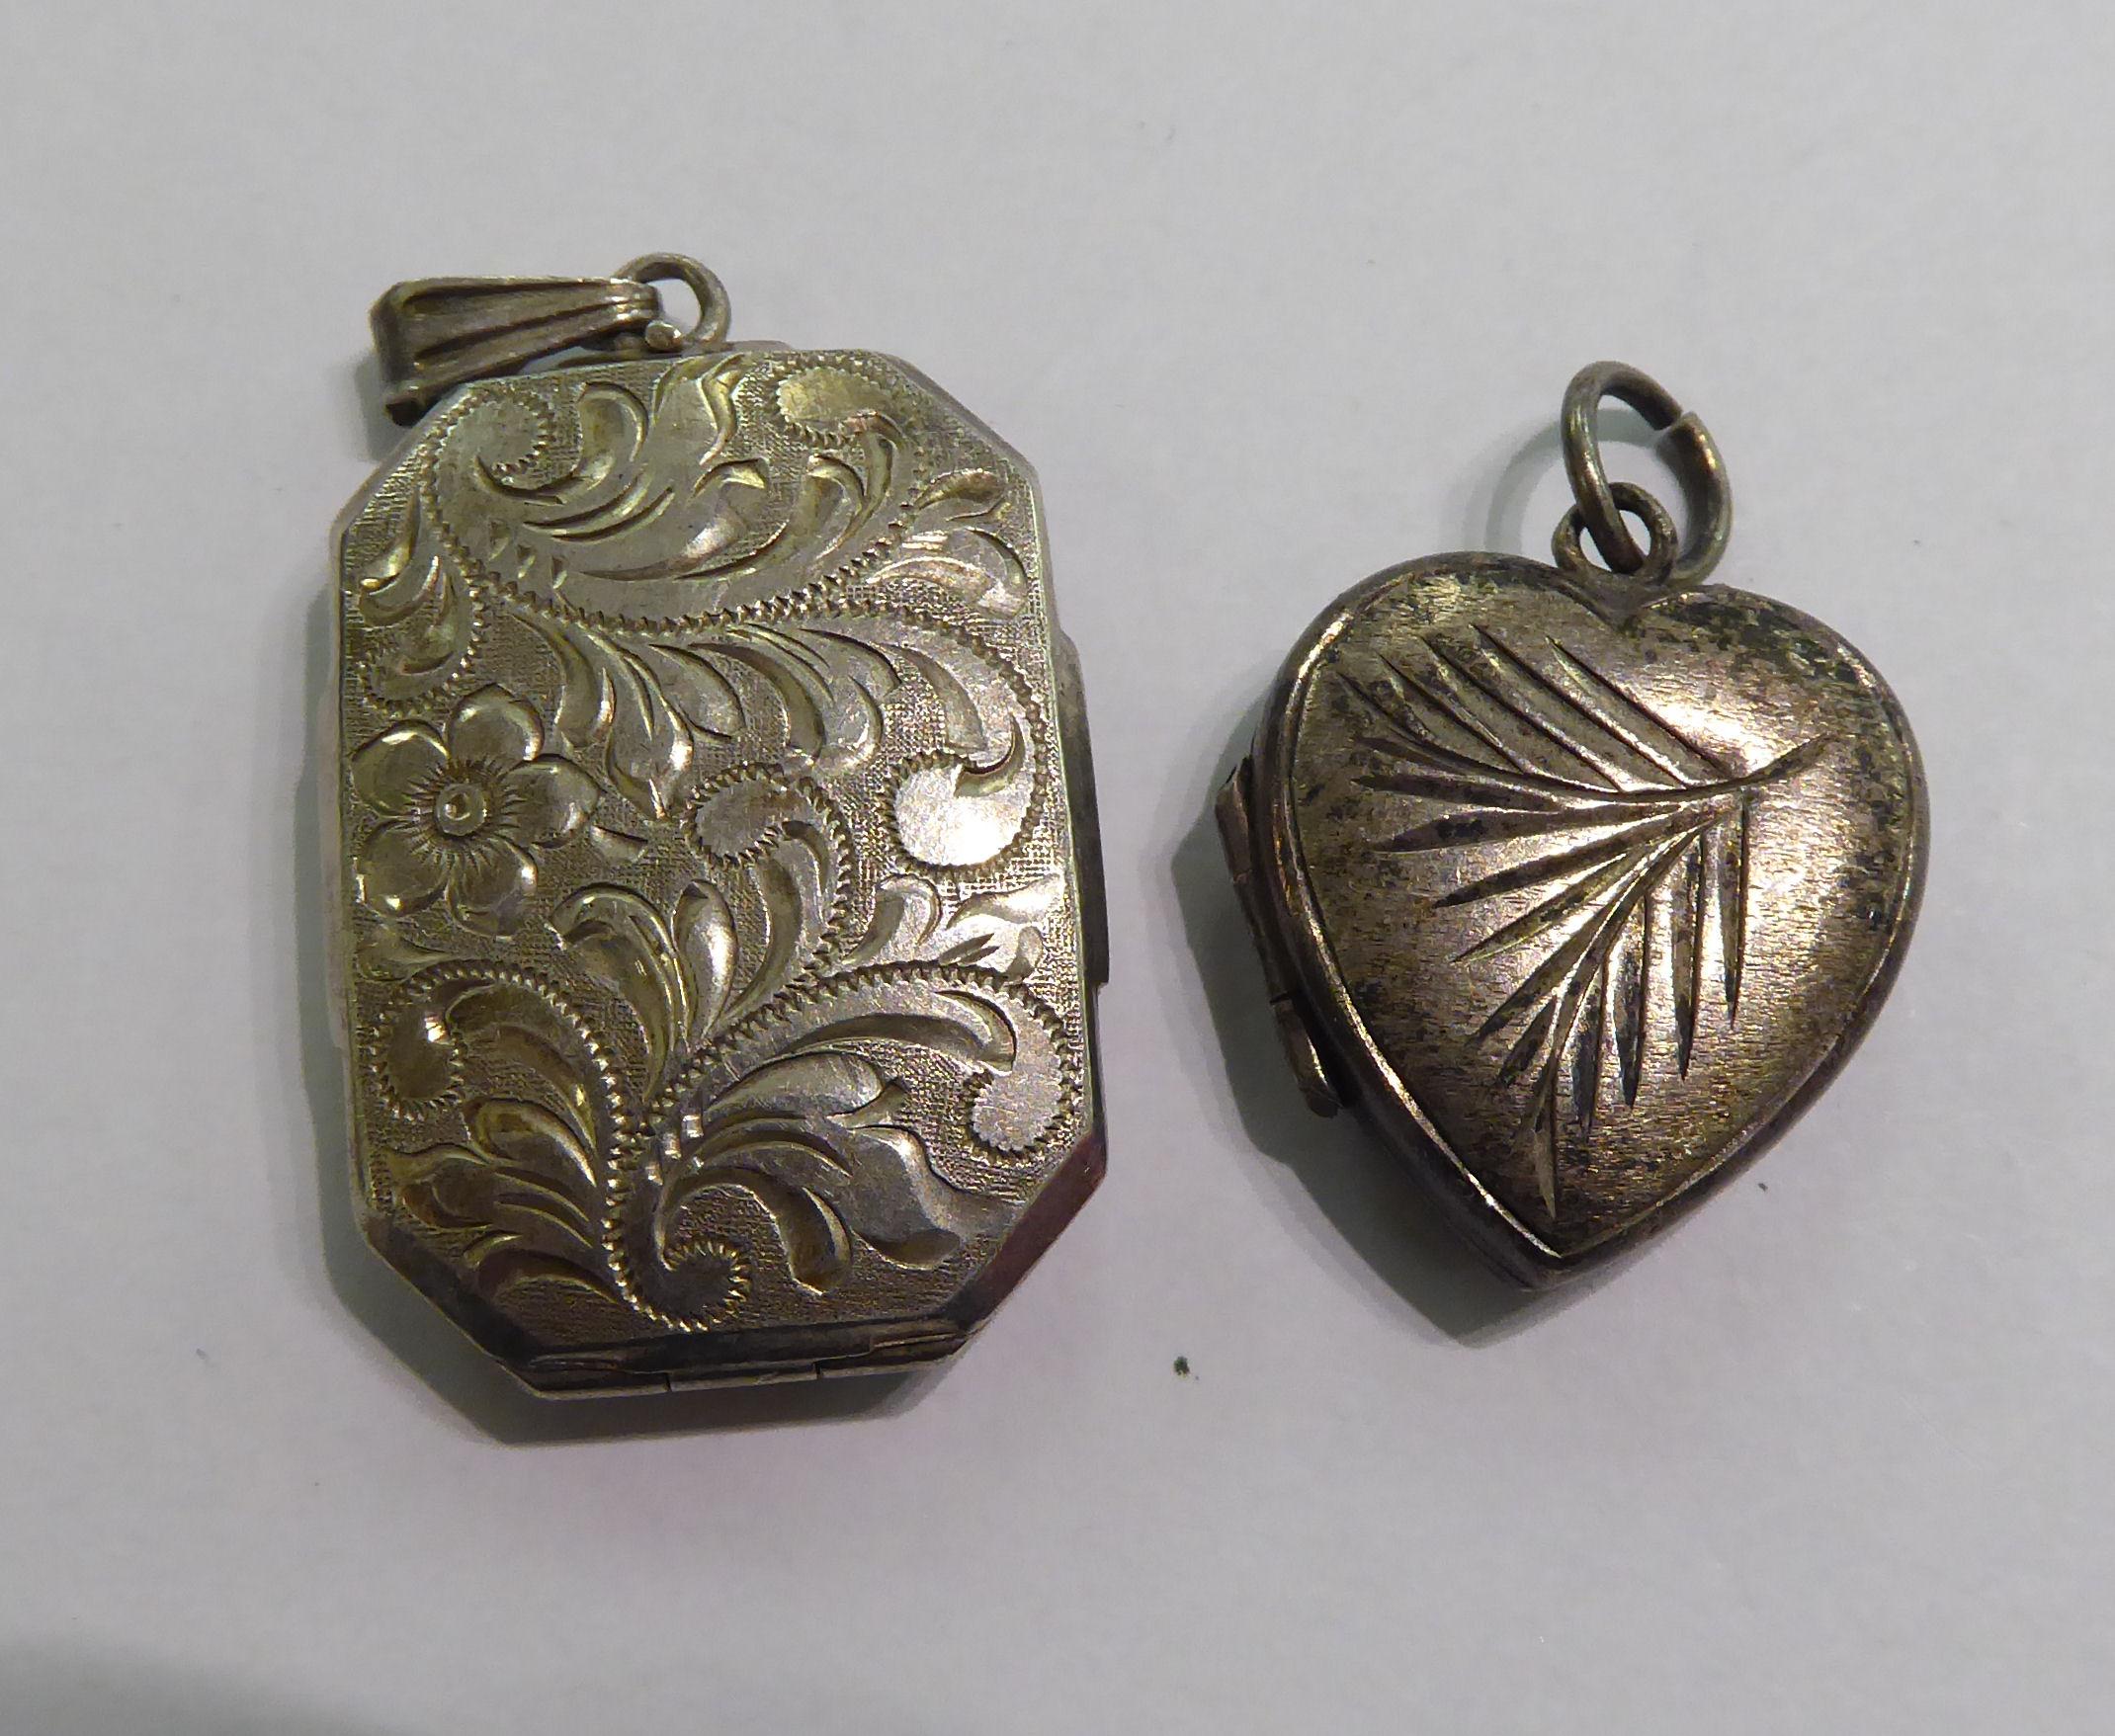 Lot 41 - Two similar 'antique' white metal pendant locks 11